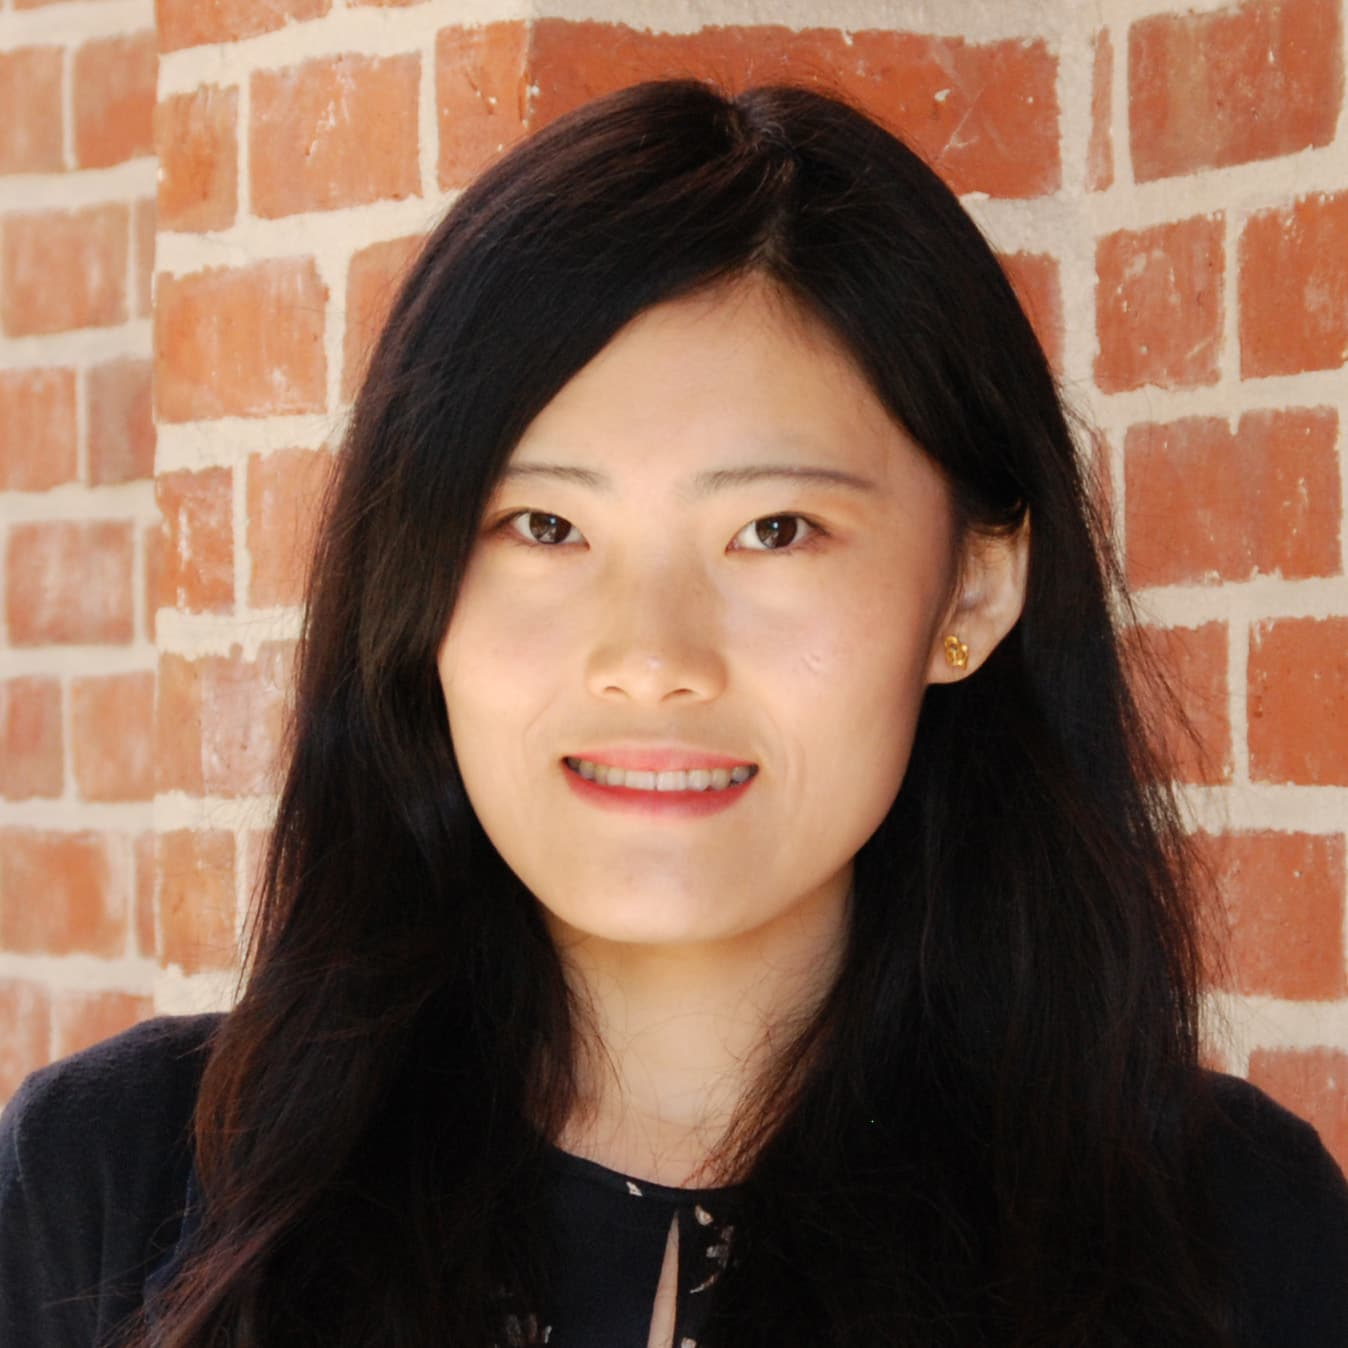 Zhe Bai : Graduate Student